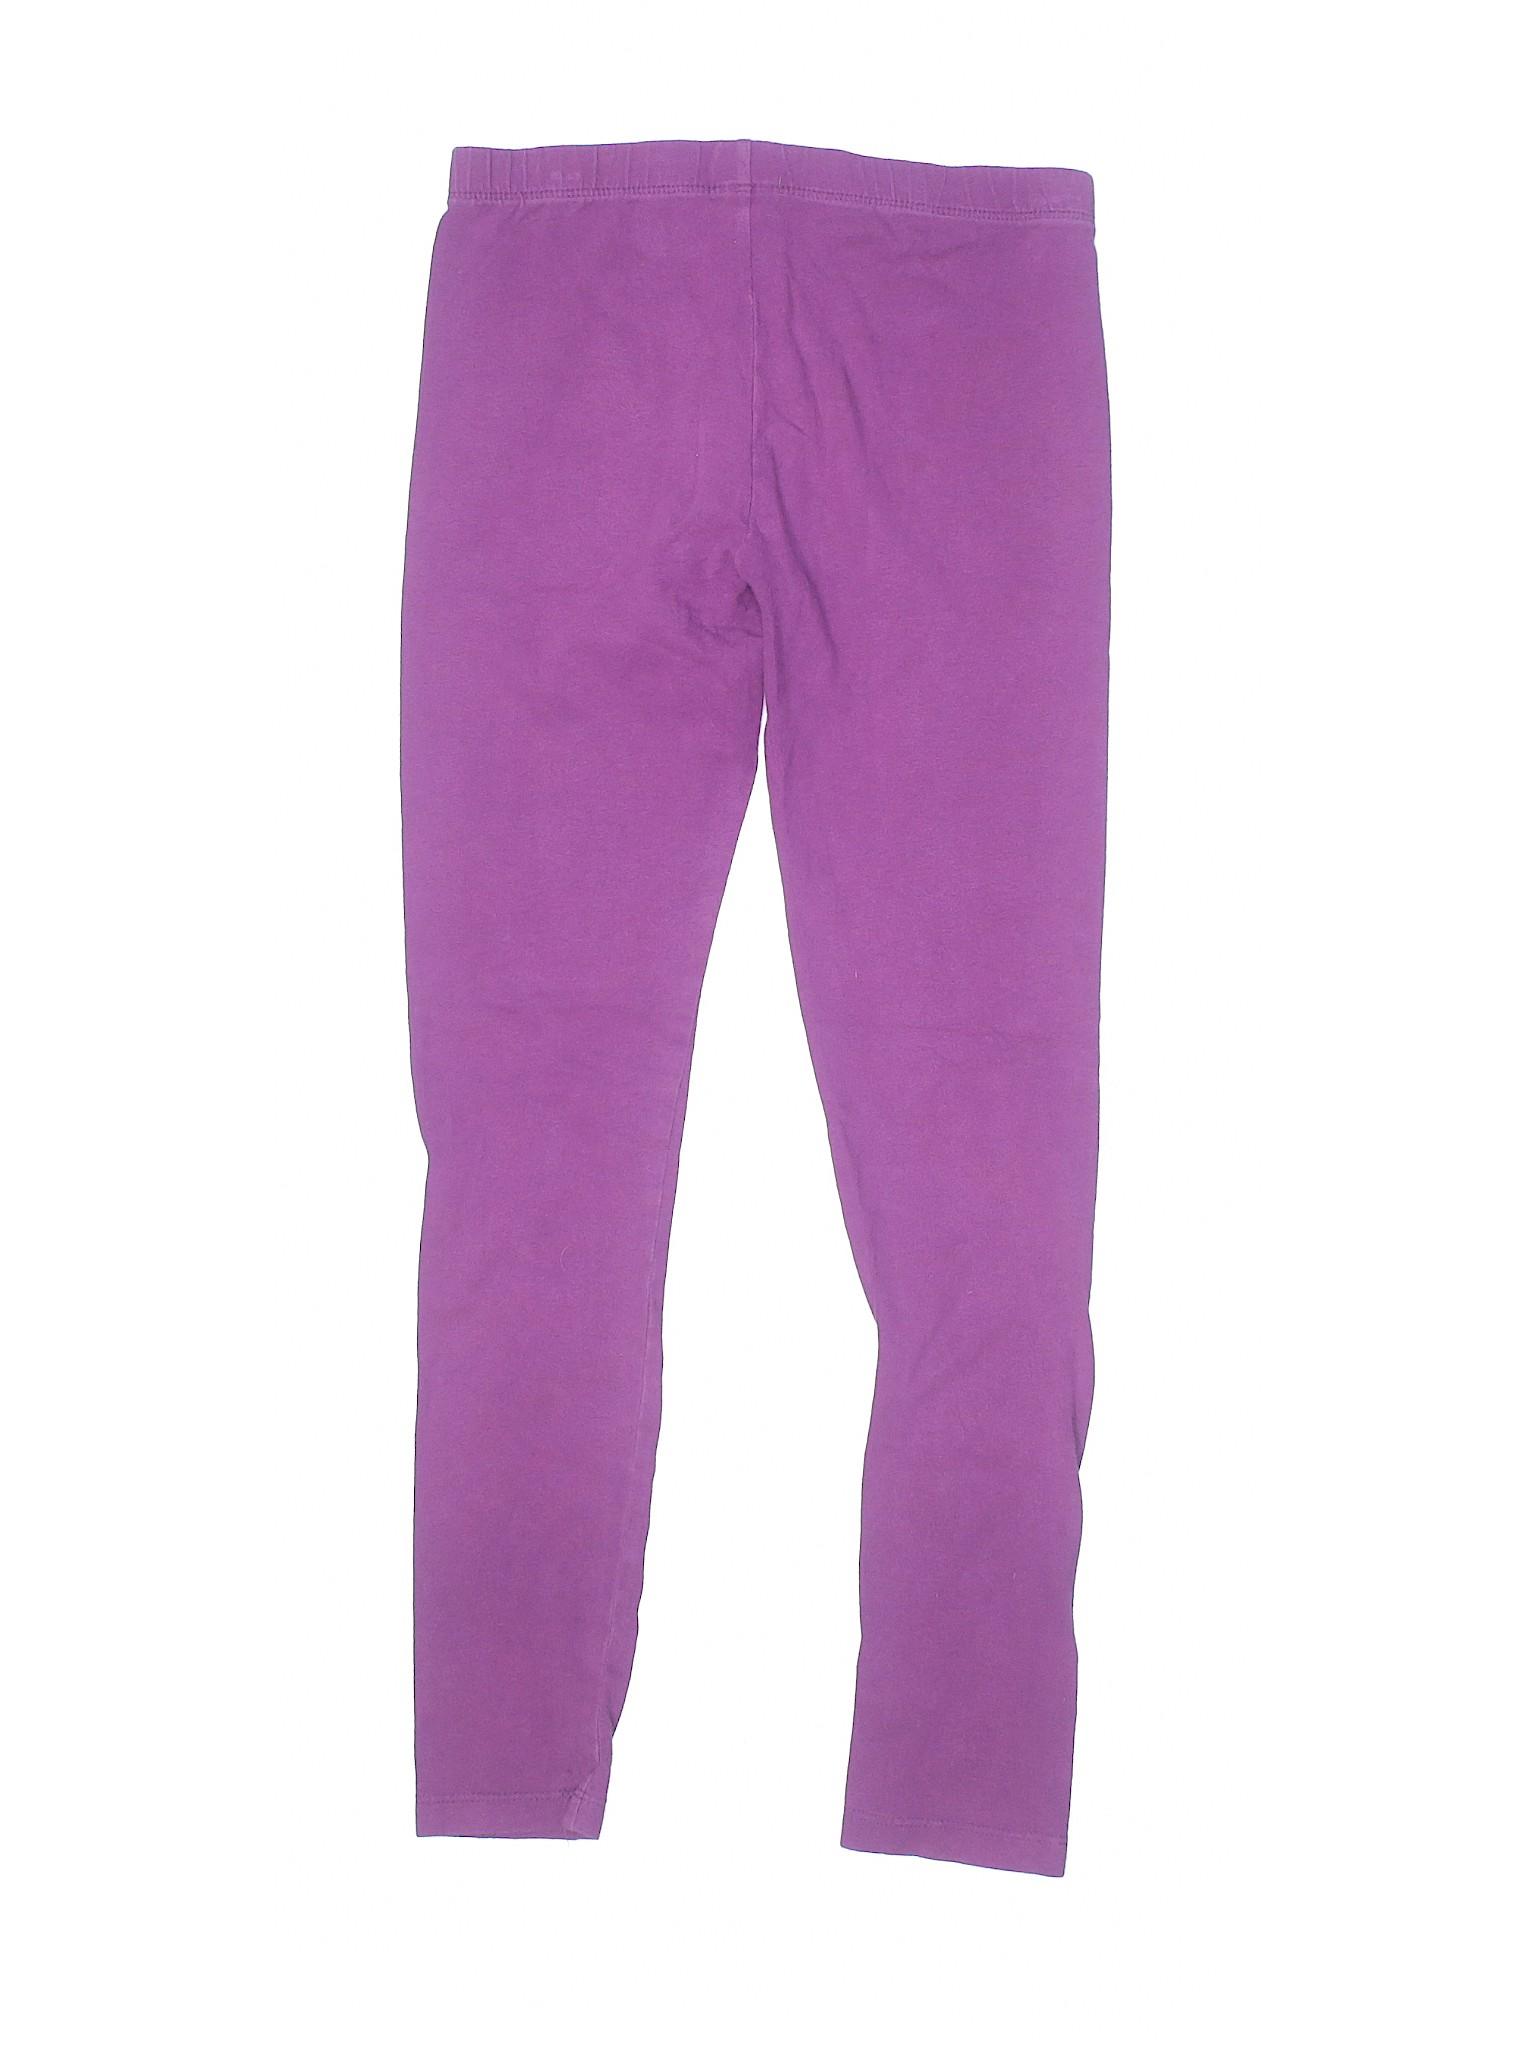 Gymboree Gymgo Active Solid Purple Shirt Kid Girls NWT Xs 4